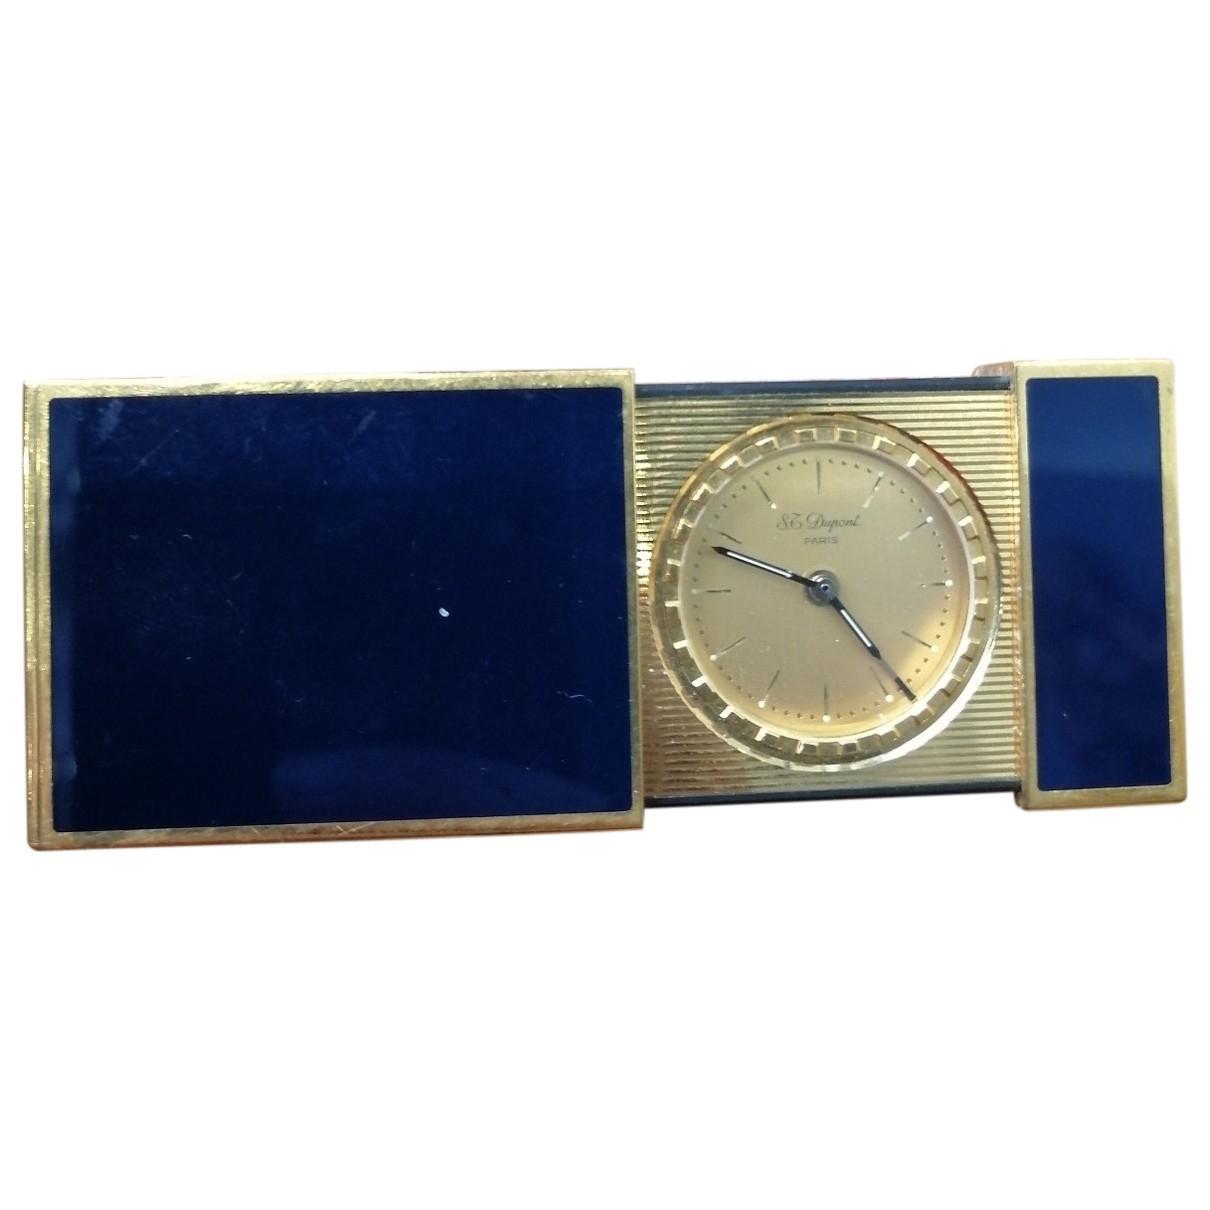 Reloj S.t. Dupont